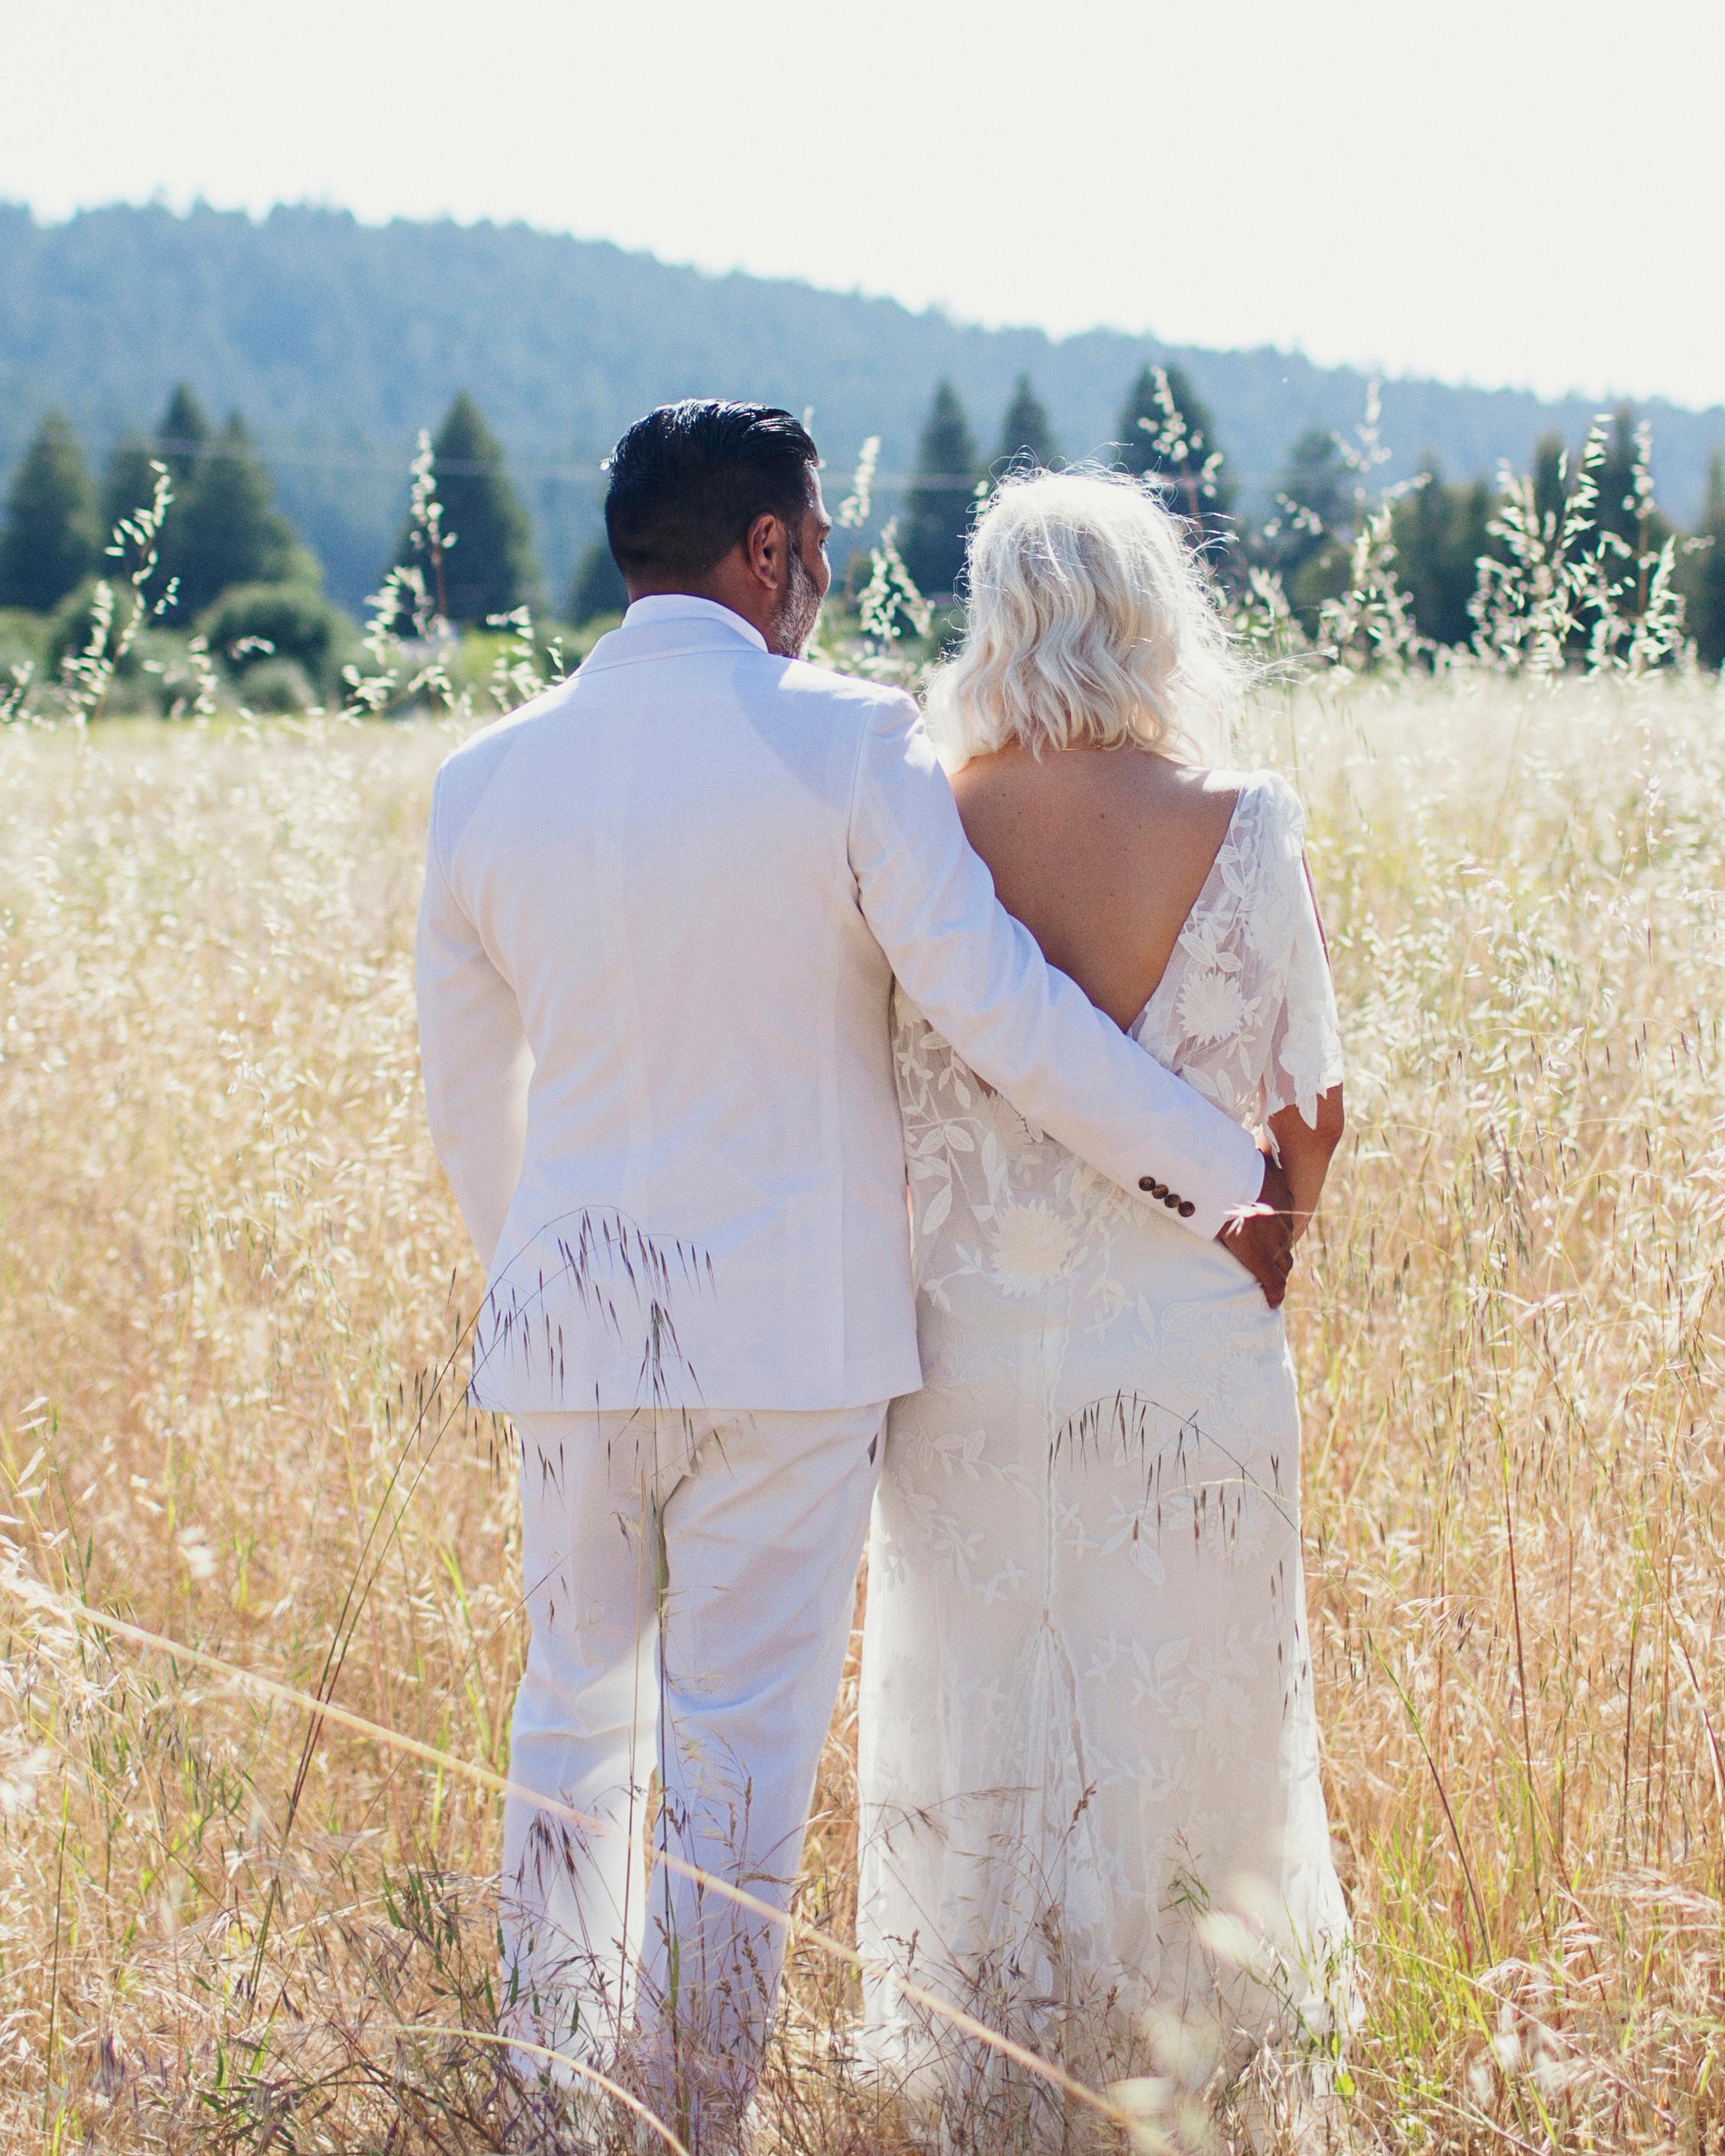 rosie-ambi-wedding-couple-5263-s112501-0116.jpg